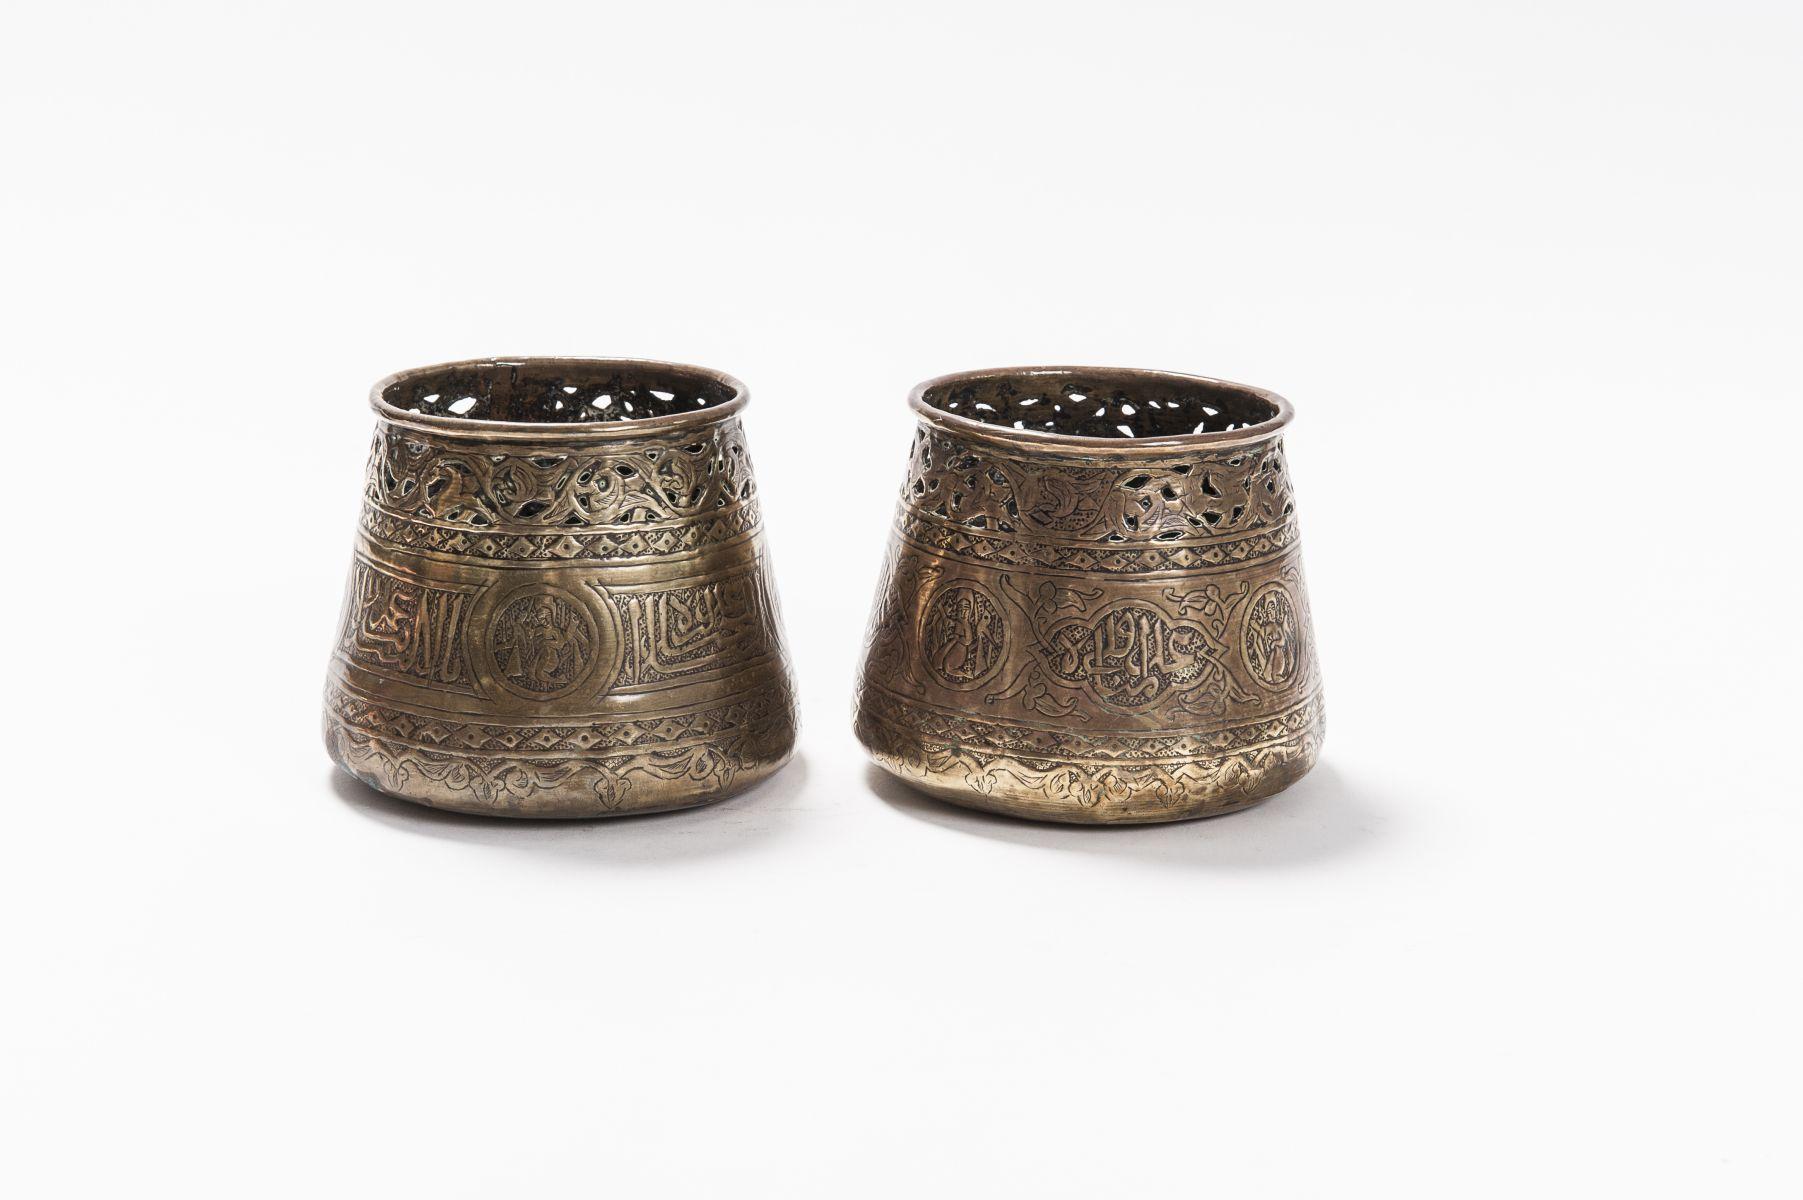 #77 2 Decorative Indo-Persian Repousse Copper Cups, 19th C.   2 dekorative indo-persische Repousse-Kupferbecher, 19. Jh. Image